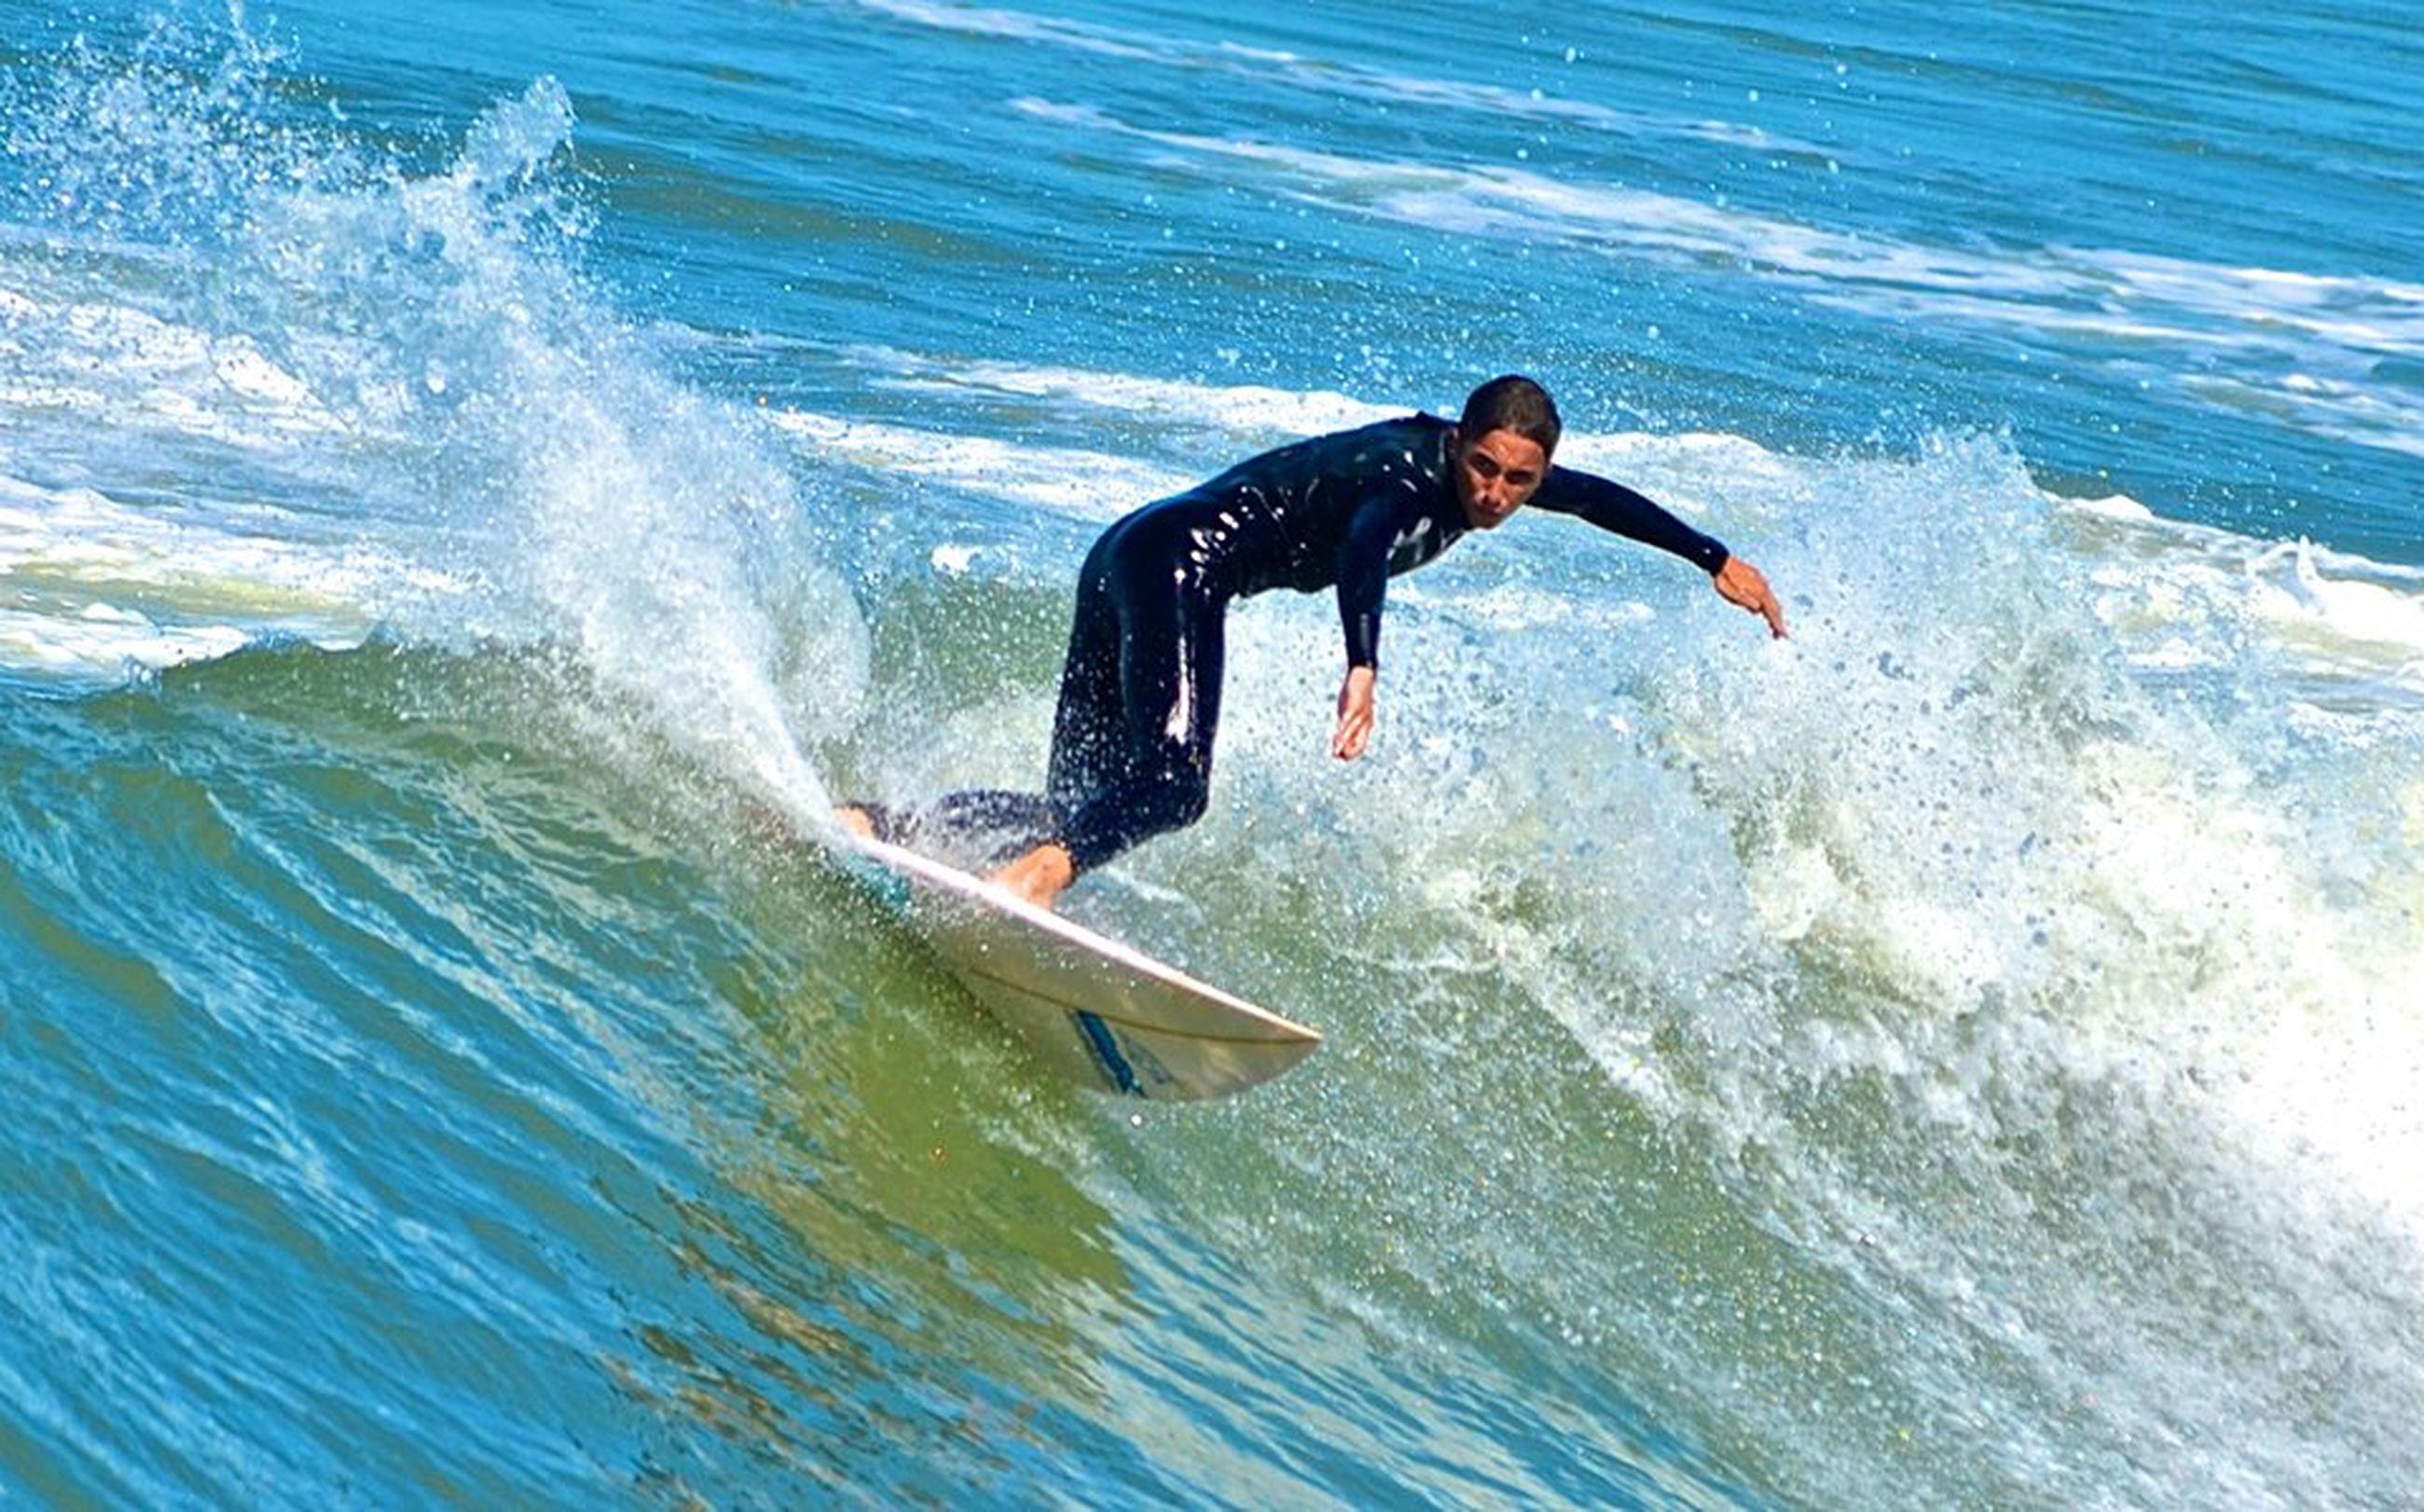 water, sea, wave, motion, waterfront, one animal, jumping, animal themes, splashing, swimming, leisure activity, full length, surfing, lifestyles, enjoyment, surf, blue, nature